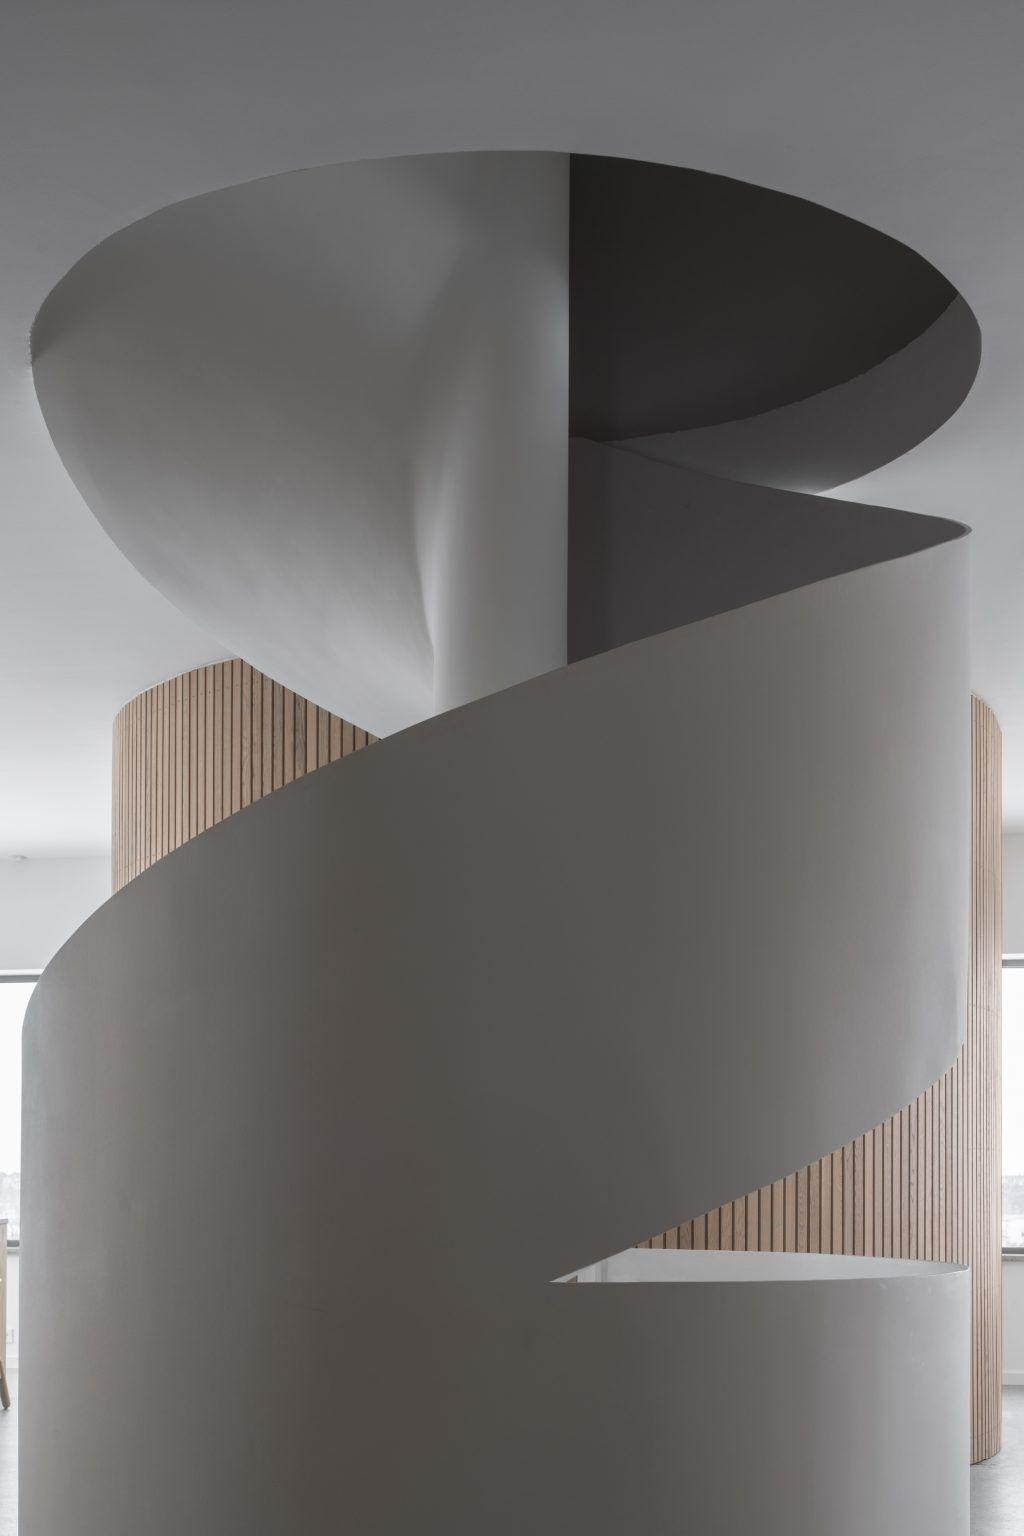 House G by Tham & Videgård